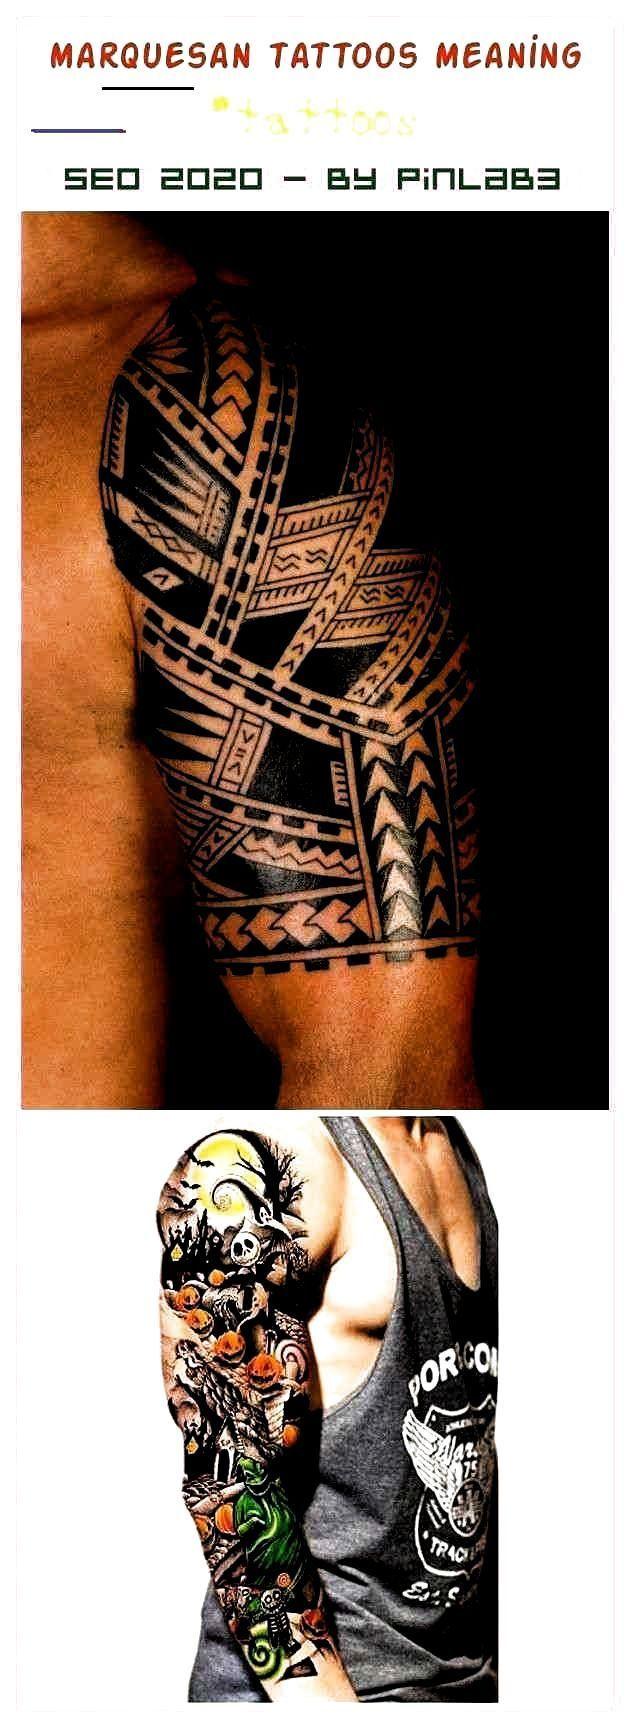 , Body art  #marquesan #tattoos #forearm marquesan tattoos forearm, marquesan tatt… #marquesantattoos #marquesan t, My Tattoo Blog 2020, My Tattoo Blog 2020